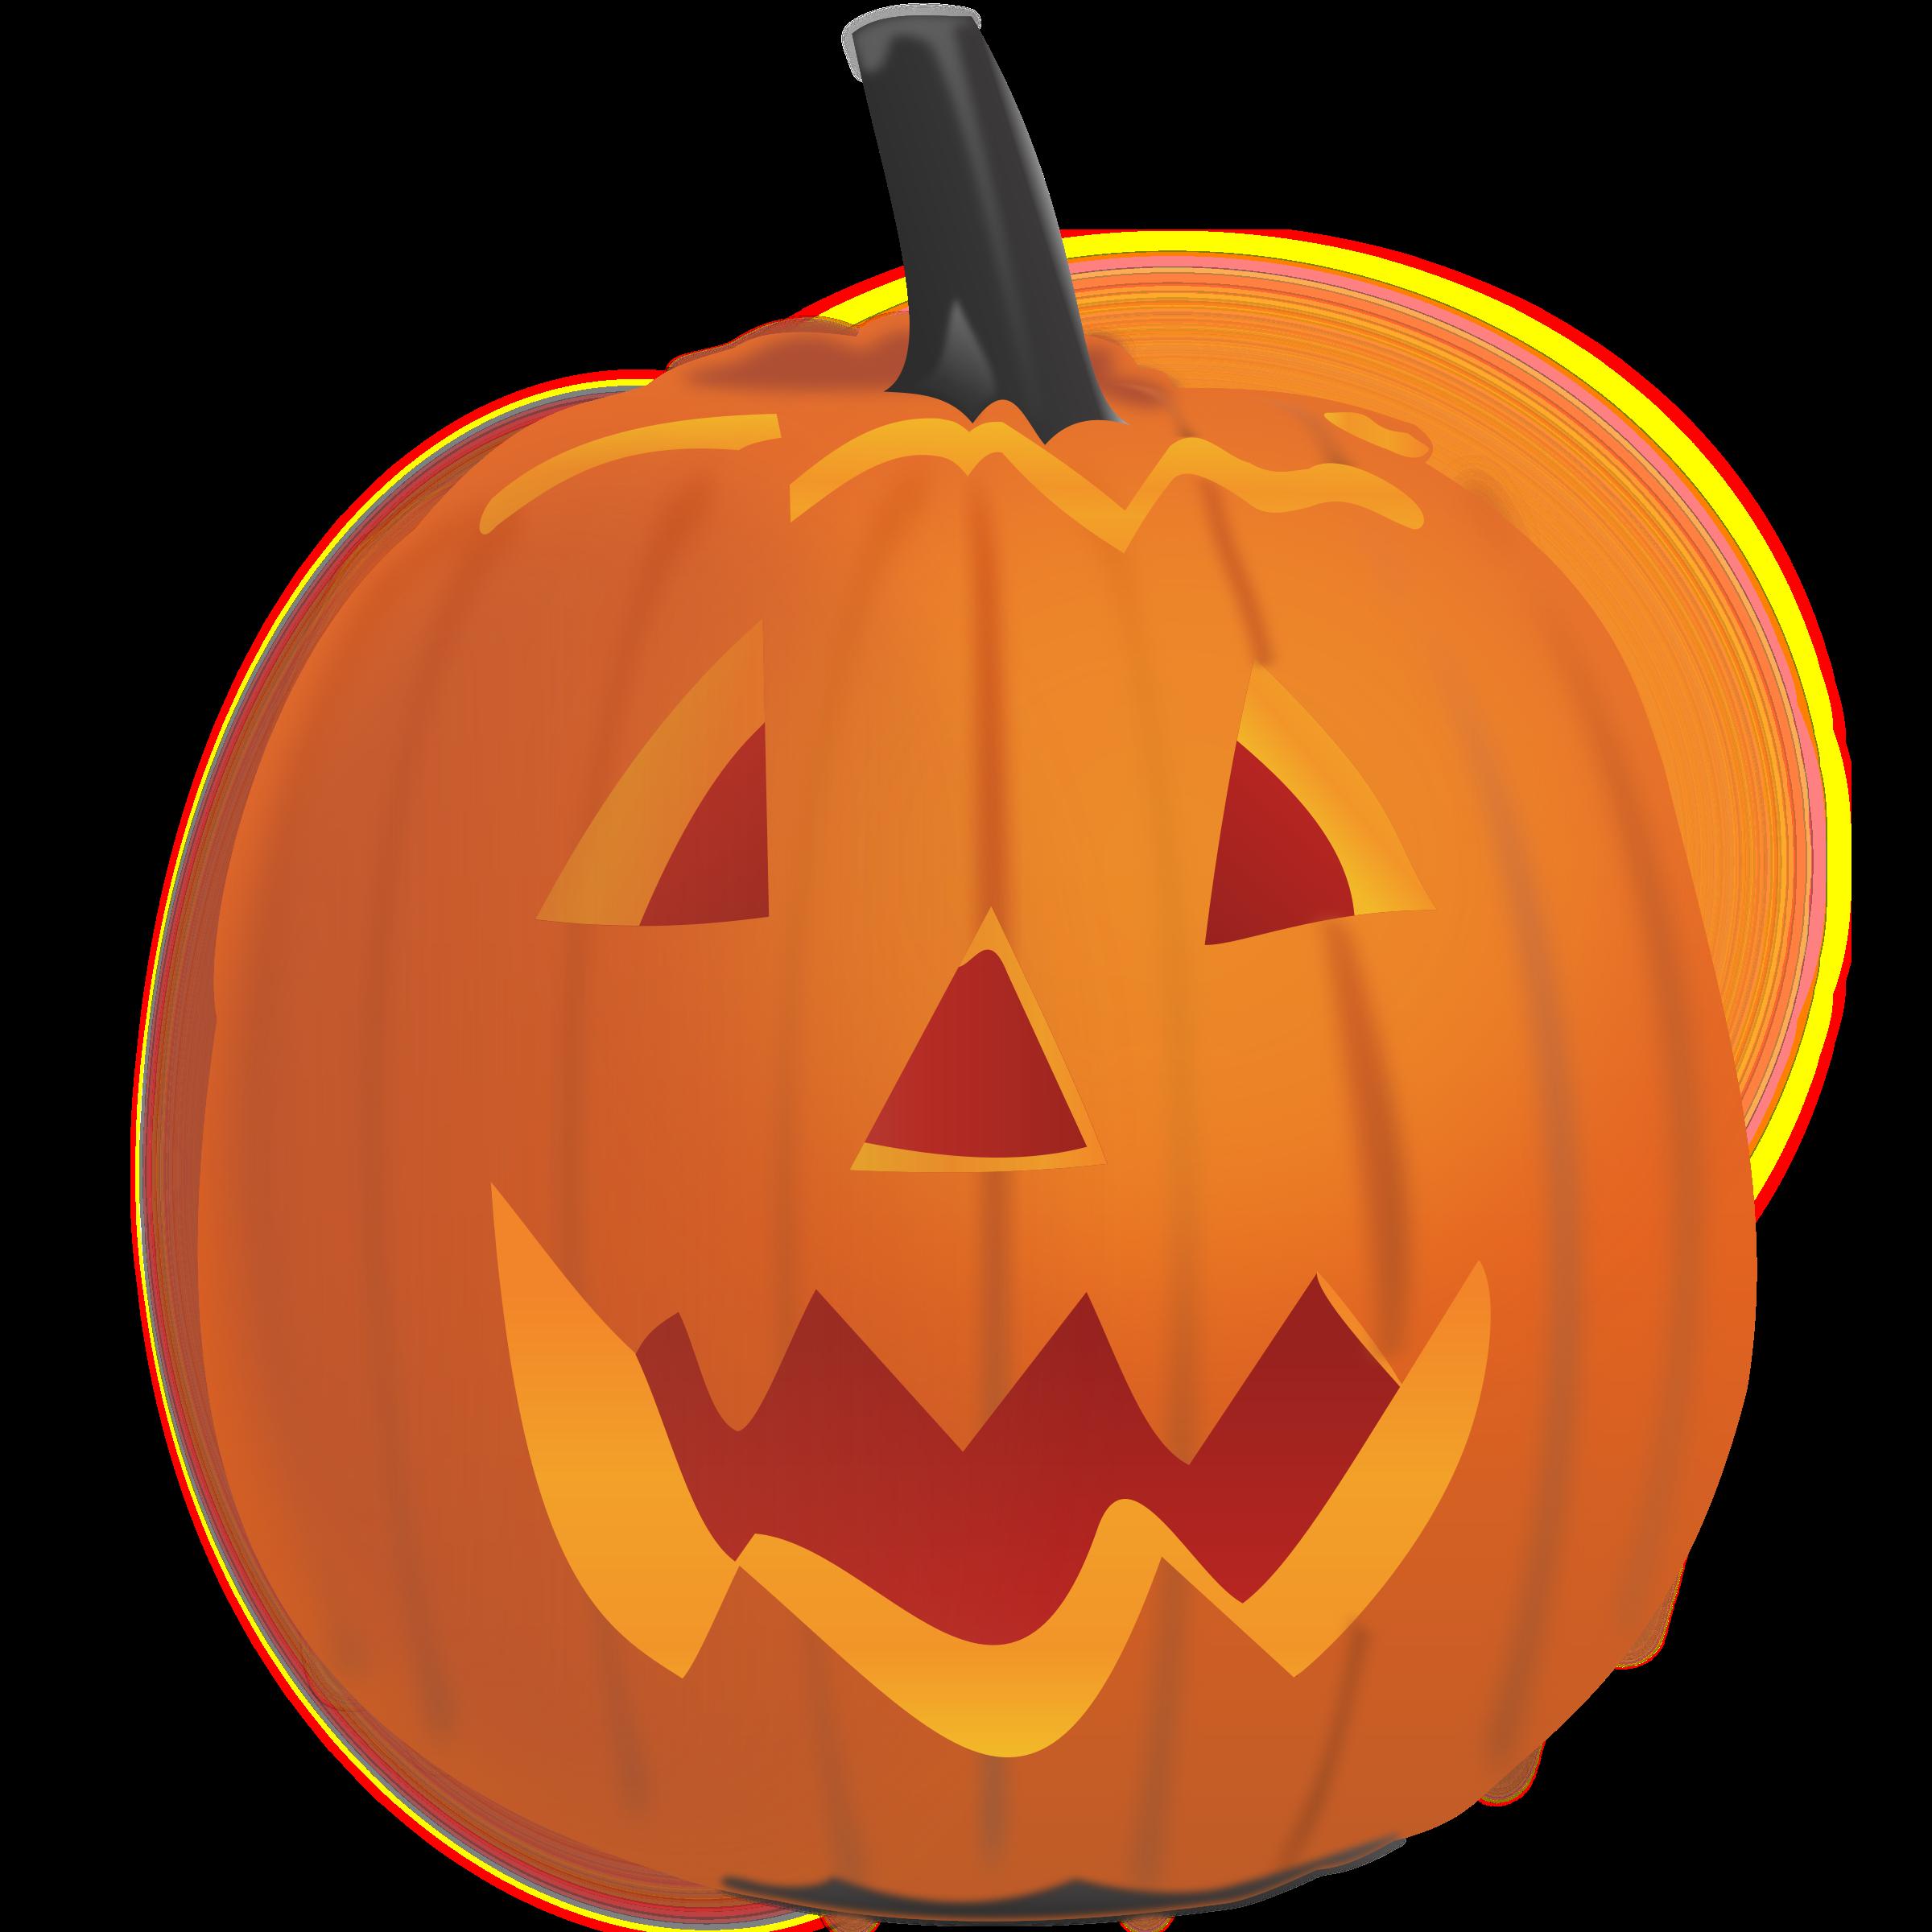 Pumpkin clipart curly. Free clip art bay